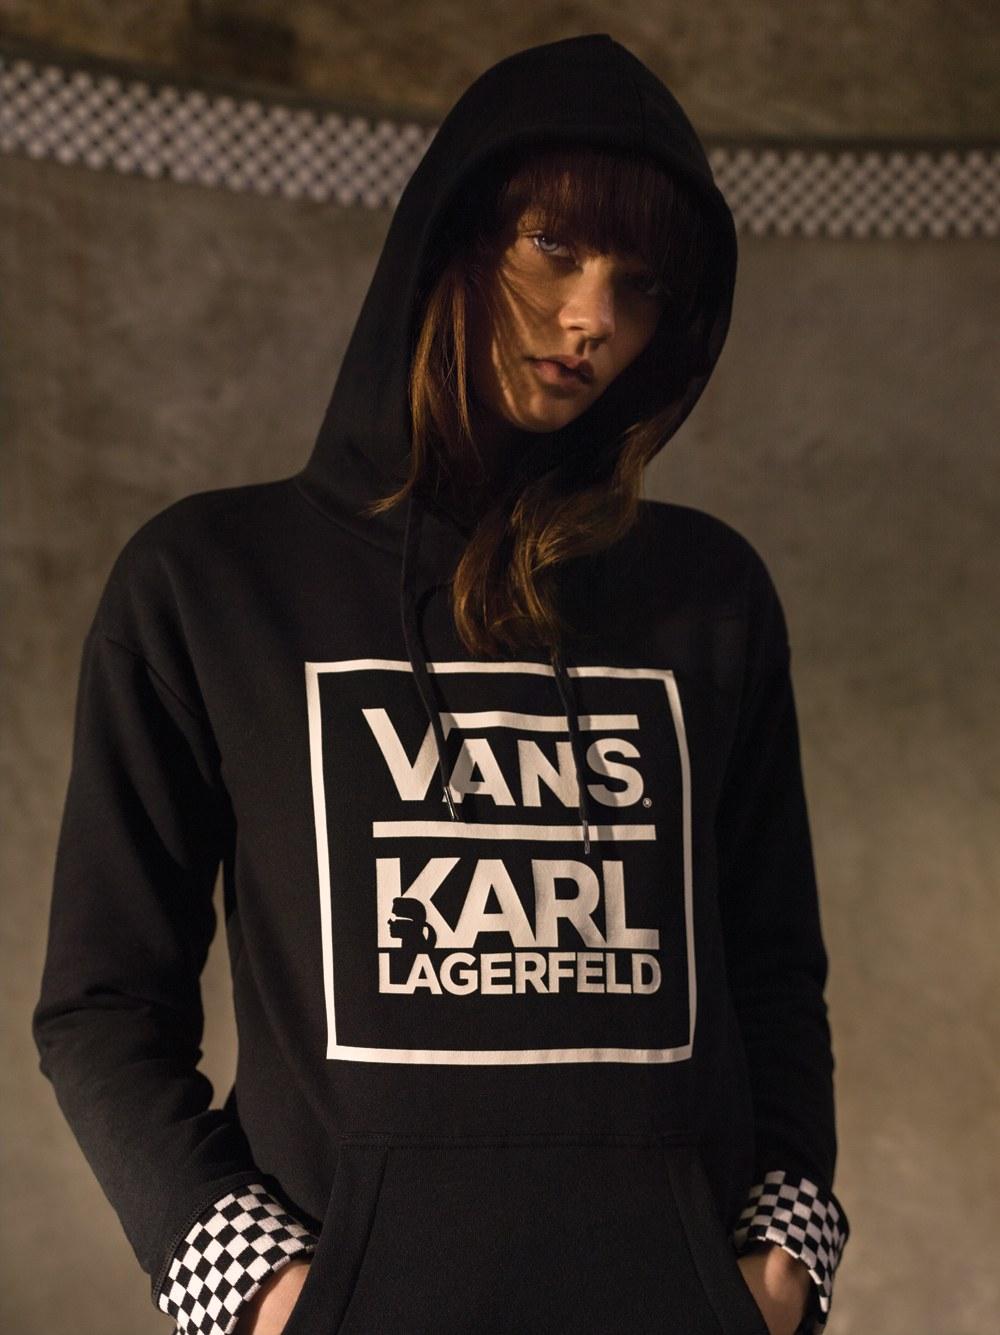 vans-x-karl-lagerfeld-folkr-01